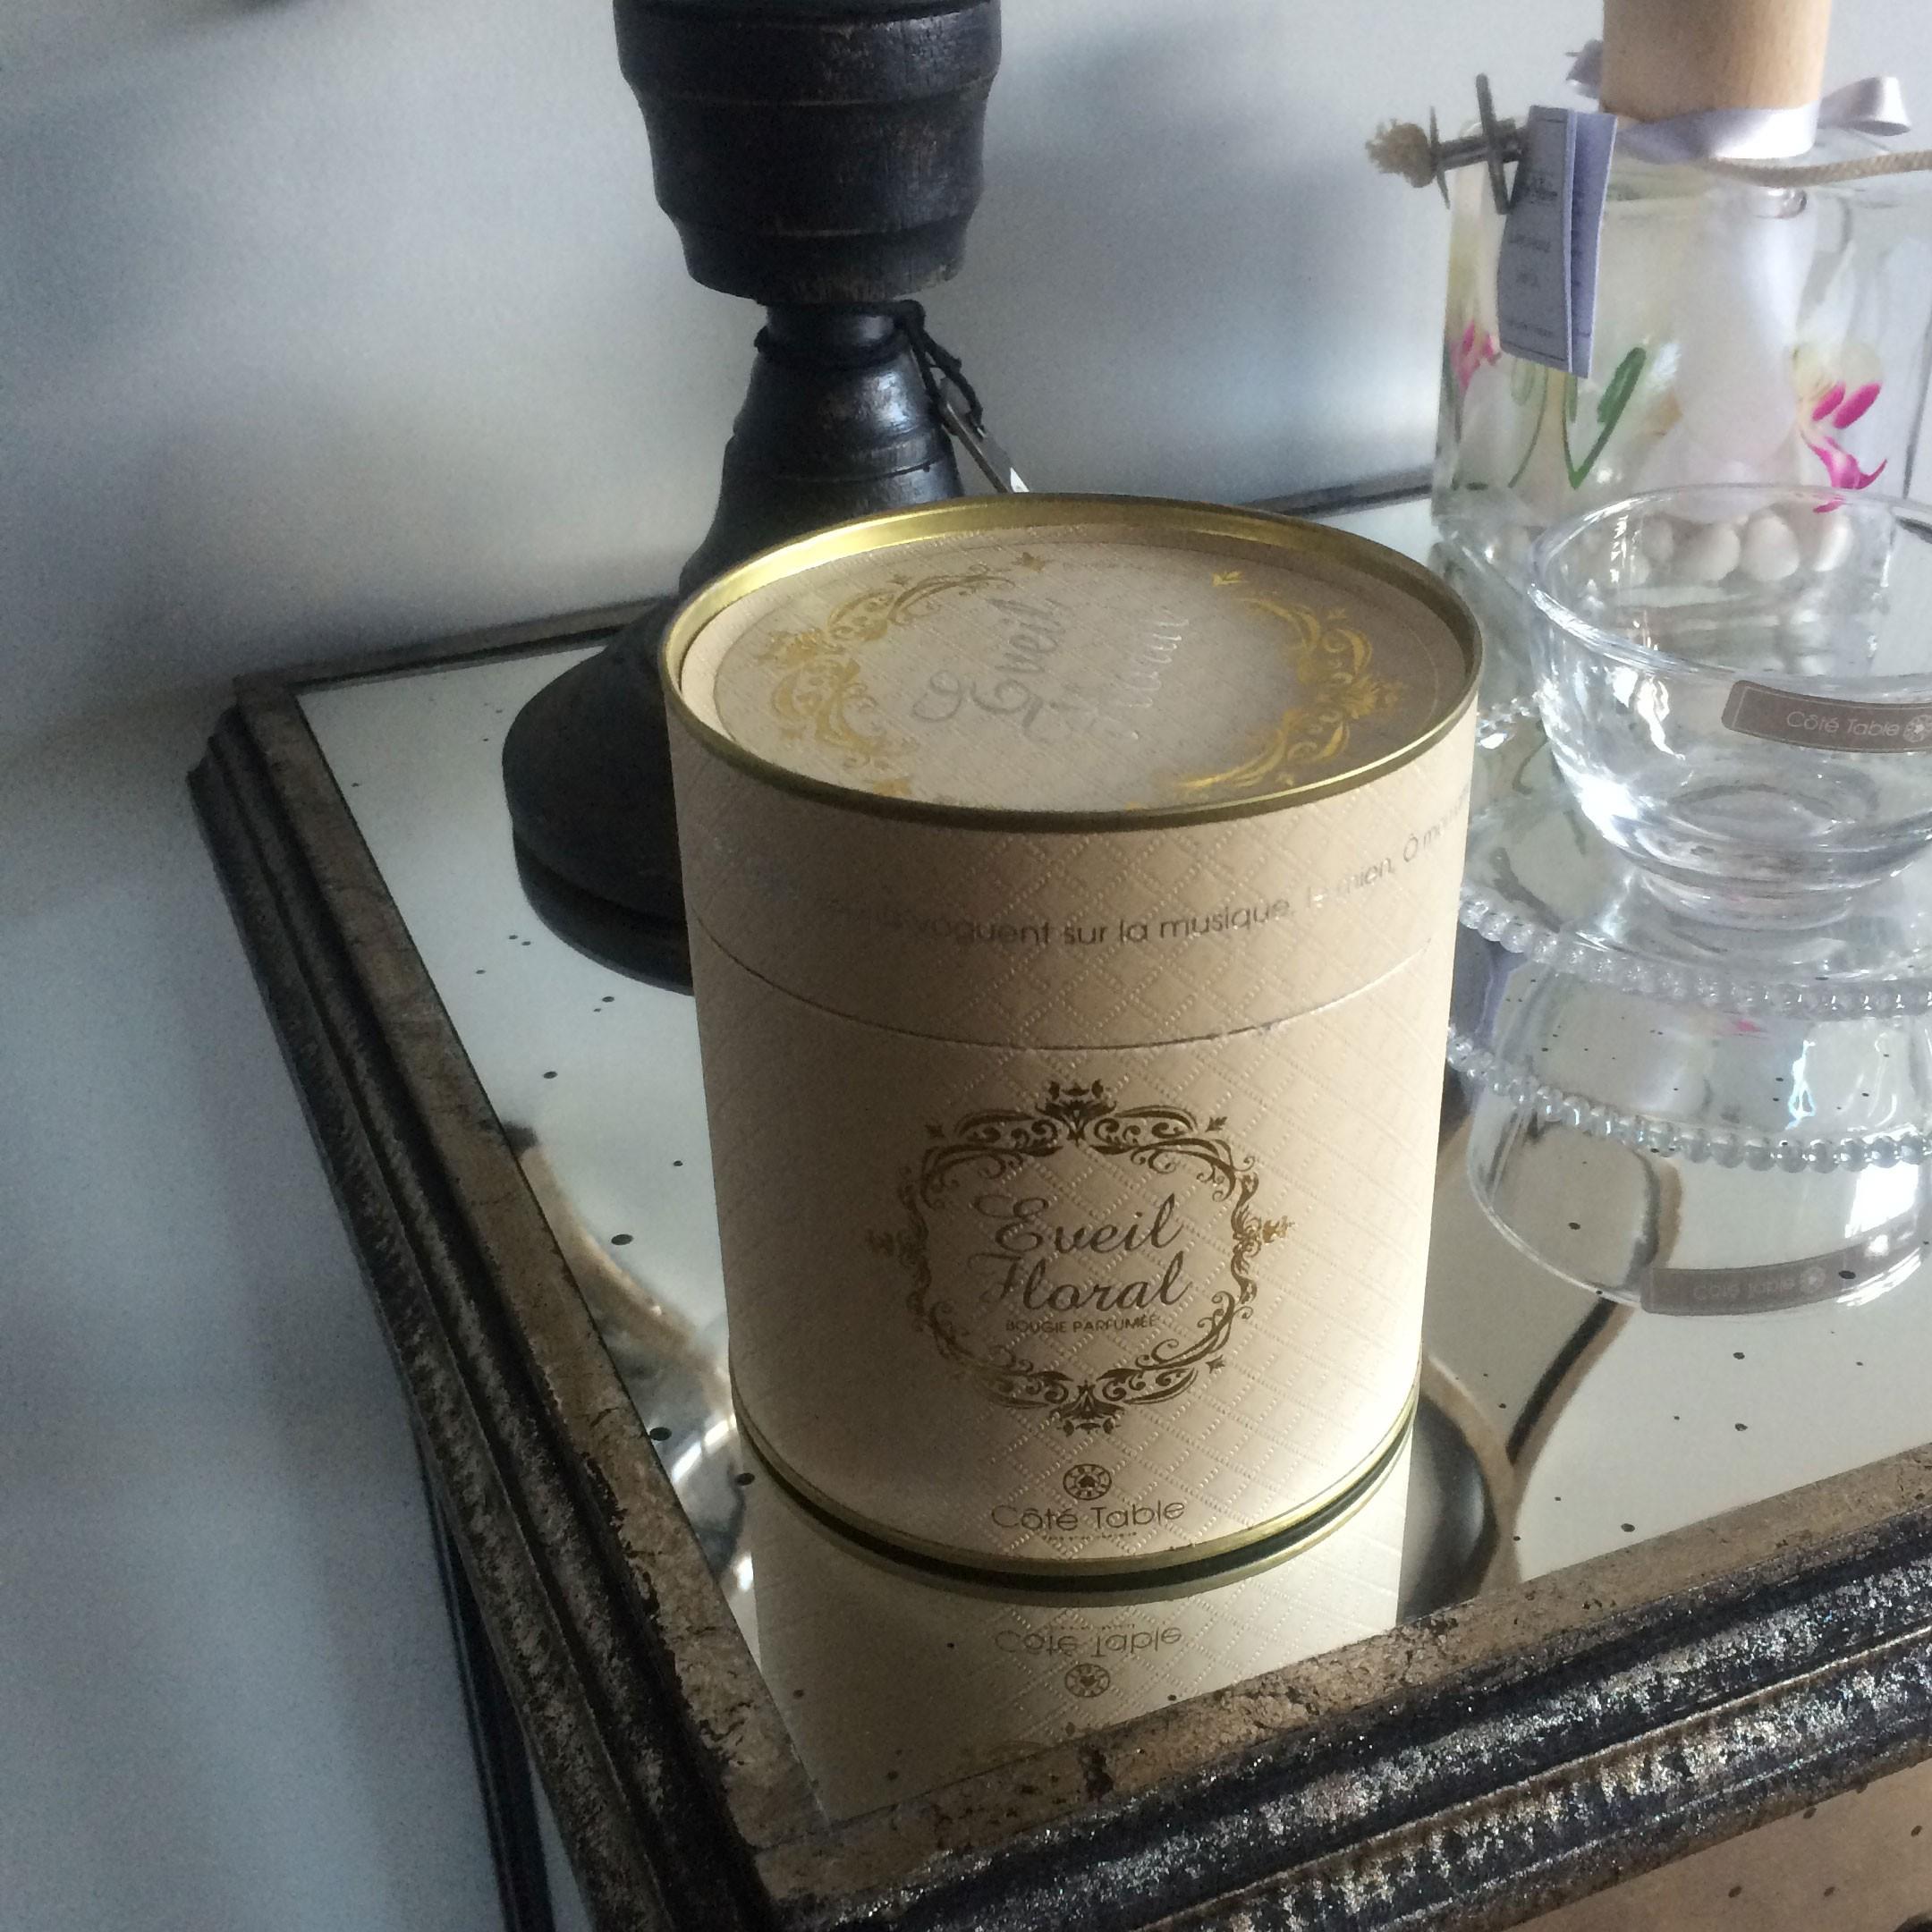 Elegance - bougie parfum de grasse eveil floral